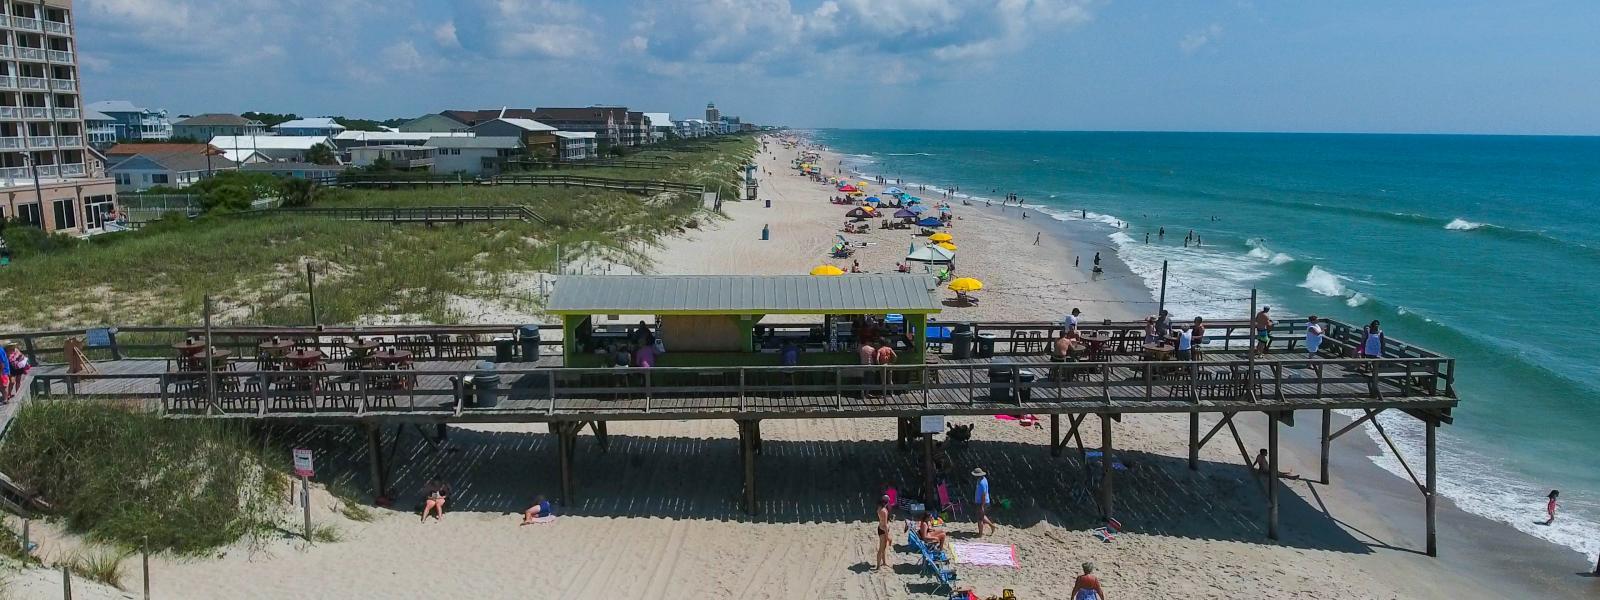 Surfchex Carolina Beach Nc | Travel Guide